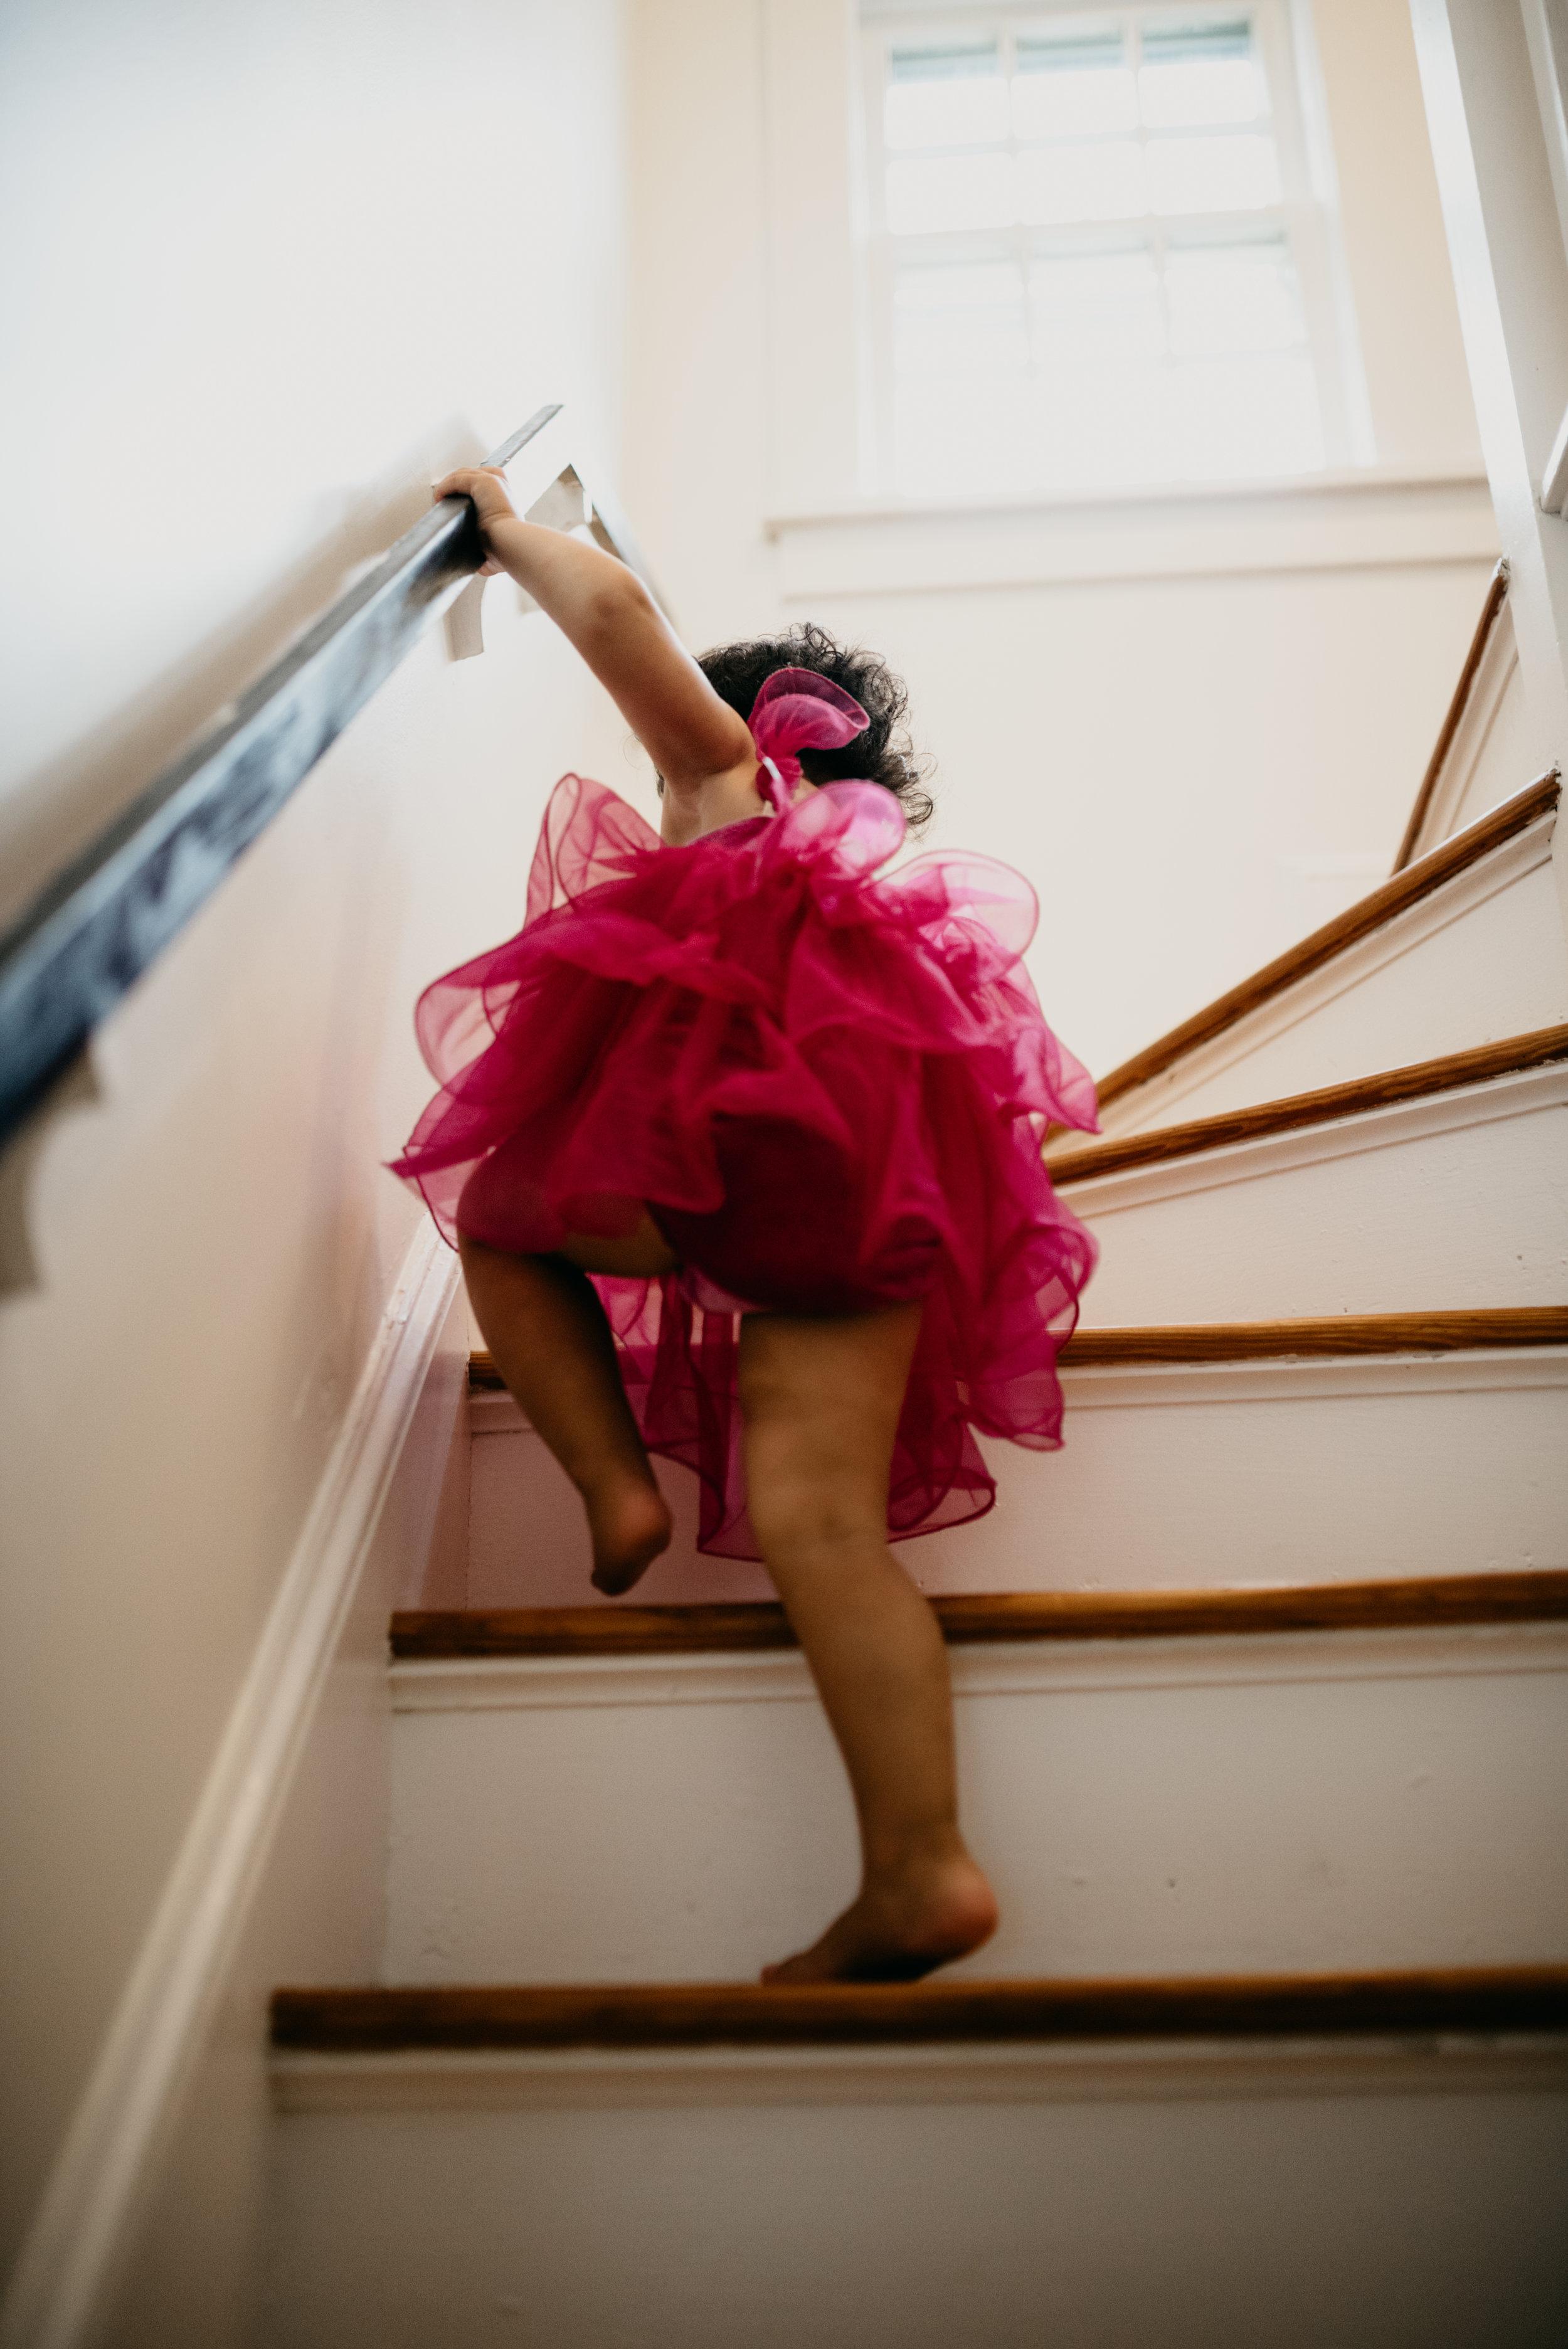 Ehrman-Massachusetts-In Home Lifestyle Maternity Session-Documentary Family Photographer-132.jpg